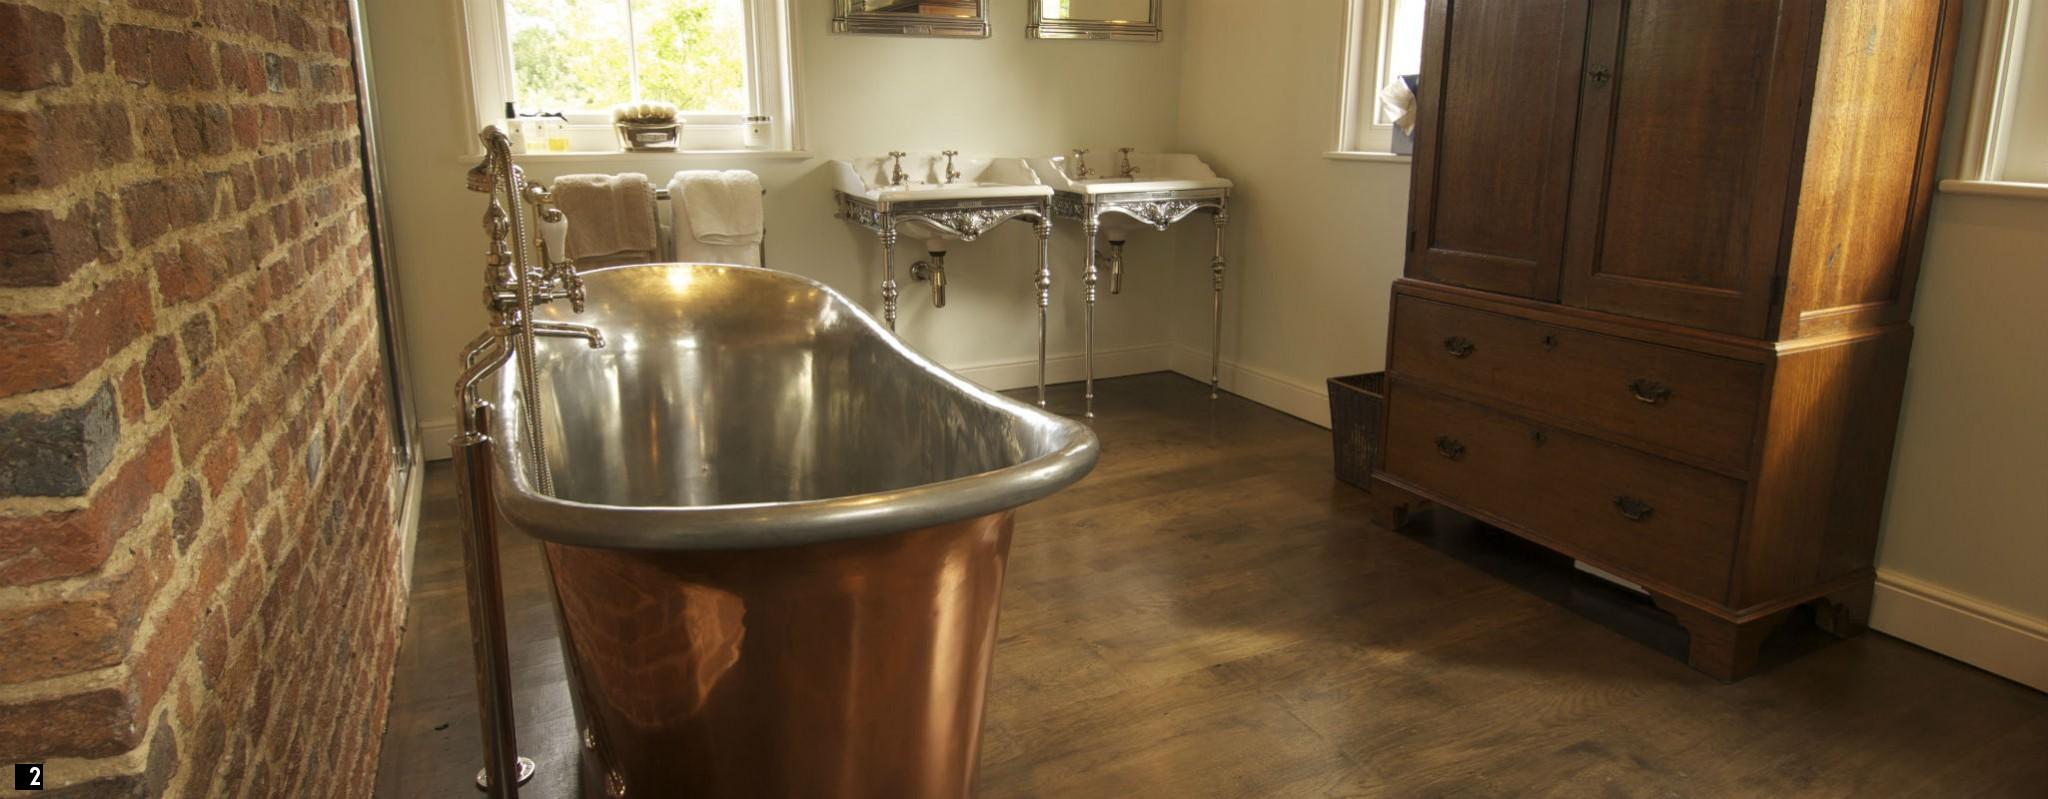 French Antique Copper Baths